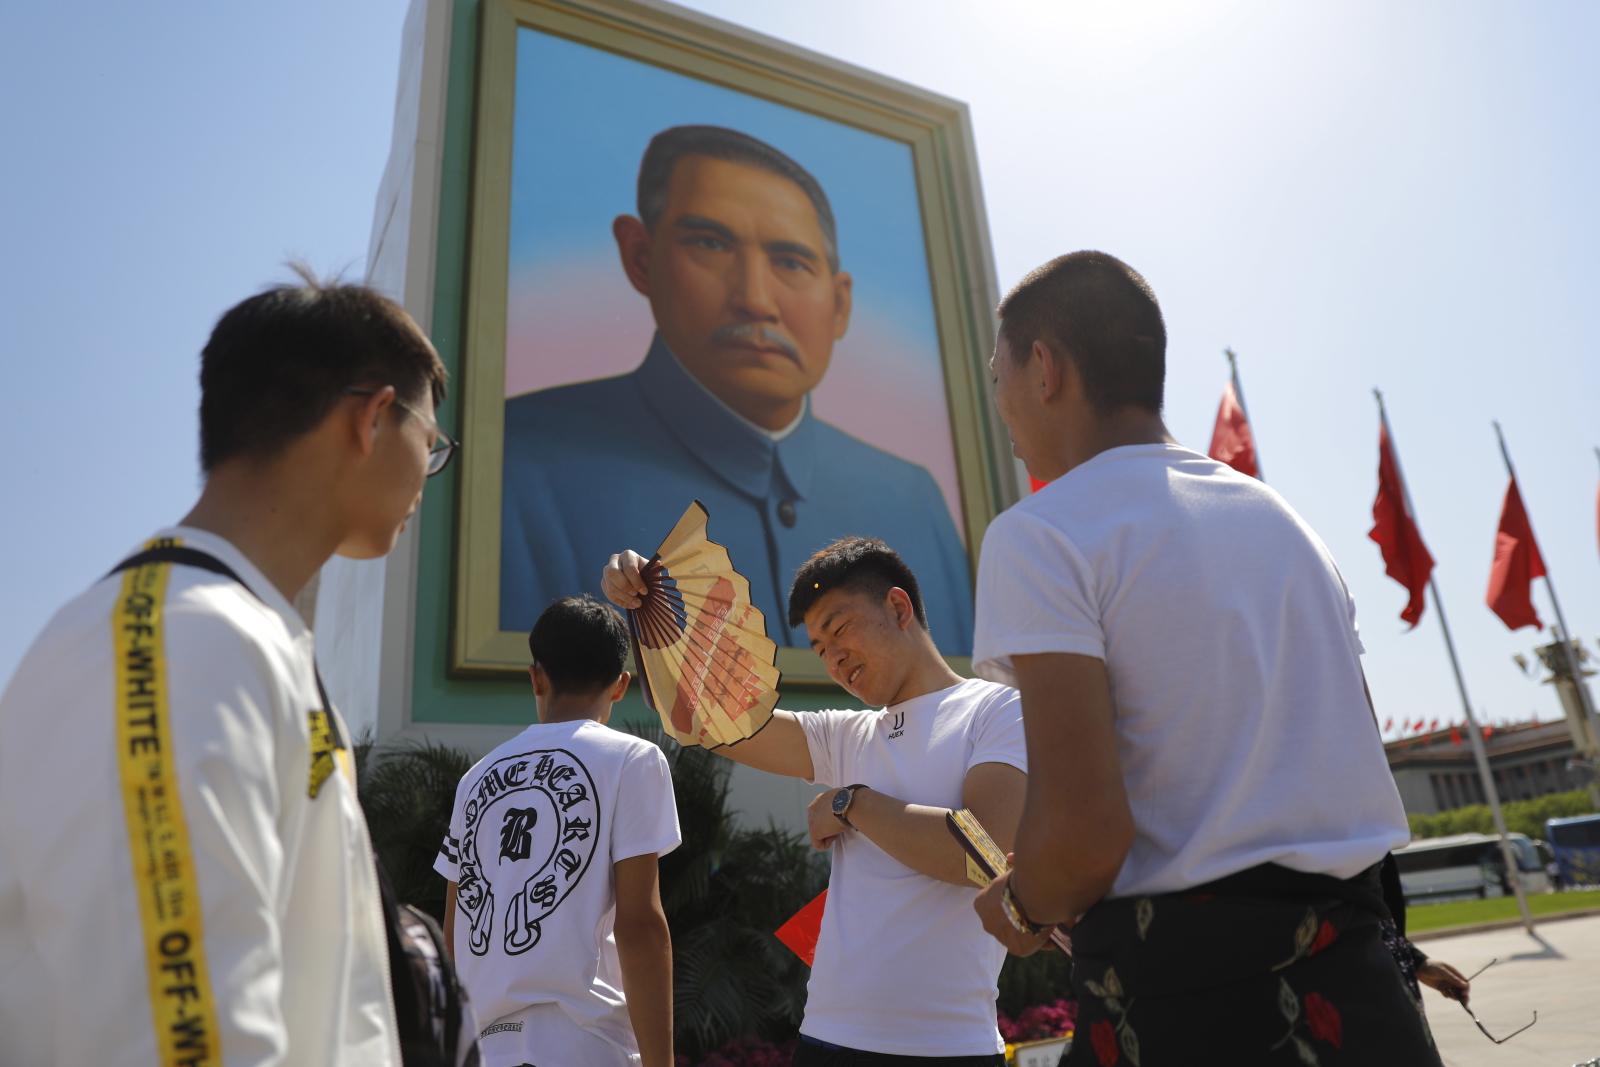 Święto Pracy w Chinach  EPA/WU HONG